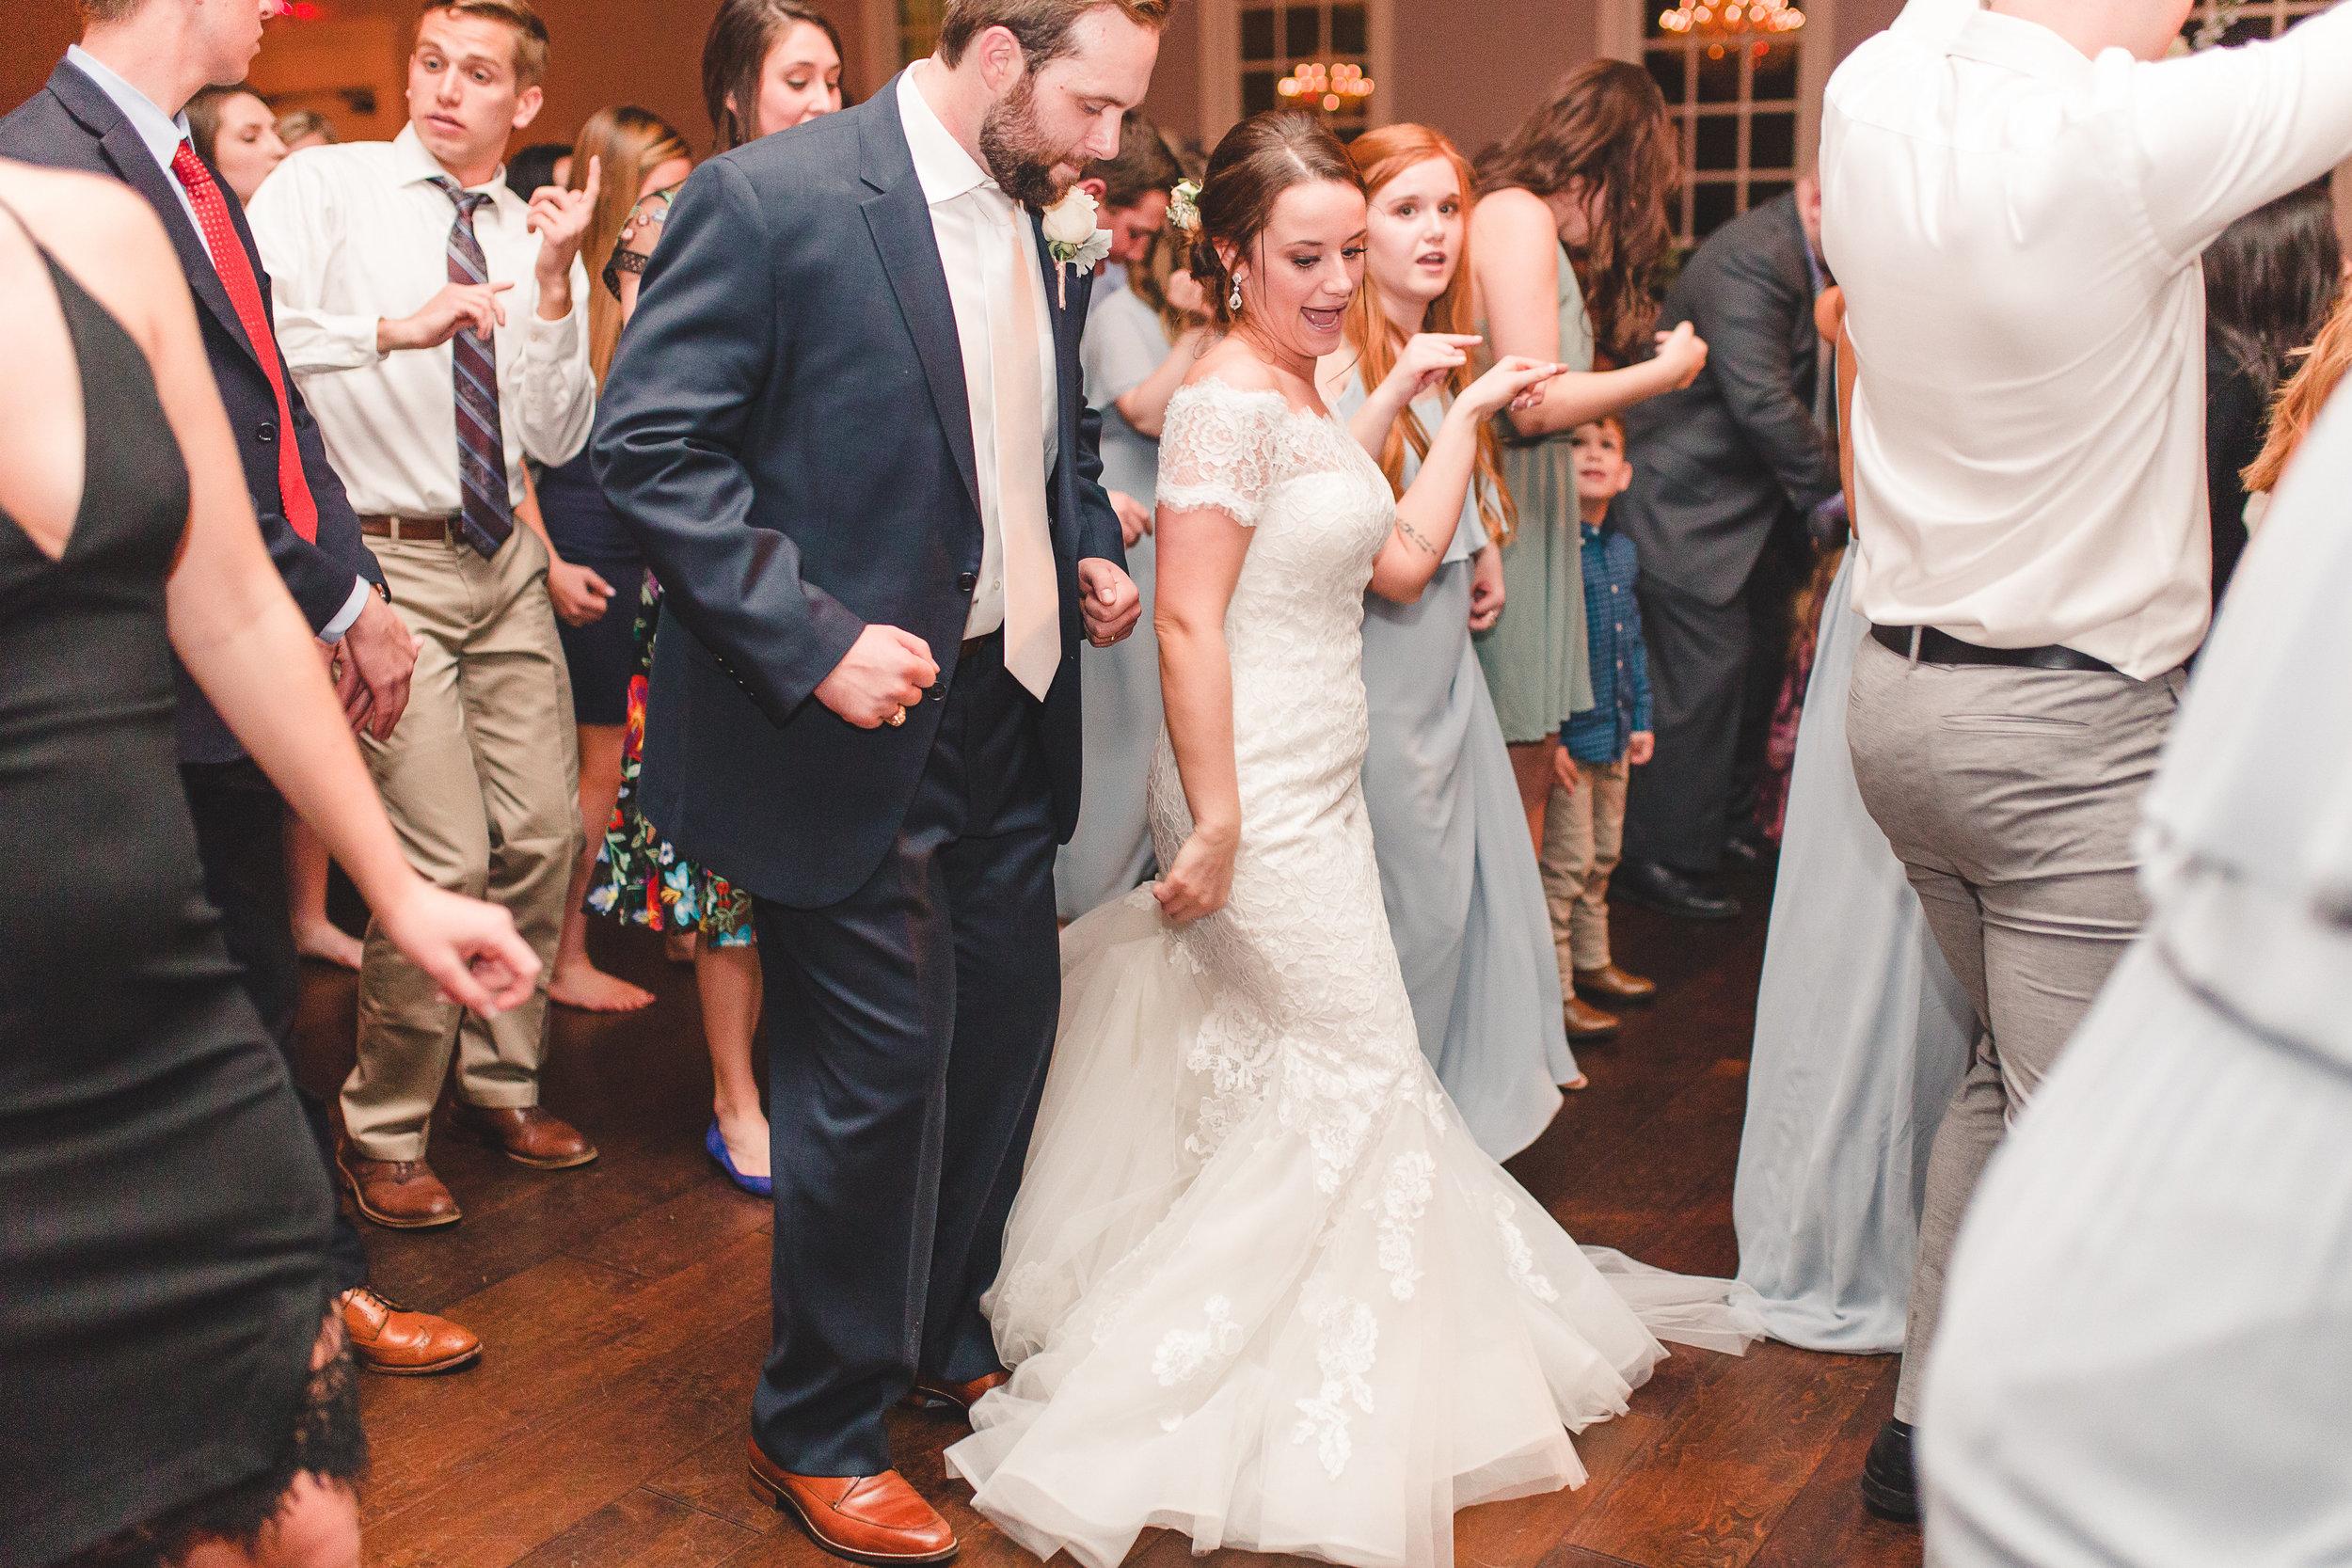 Wedding Dance Floor | Rose Gold and Dusty Blue Winter Wedding in Dallas, TX